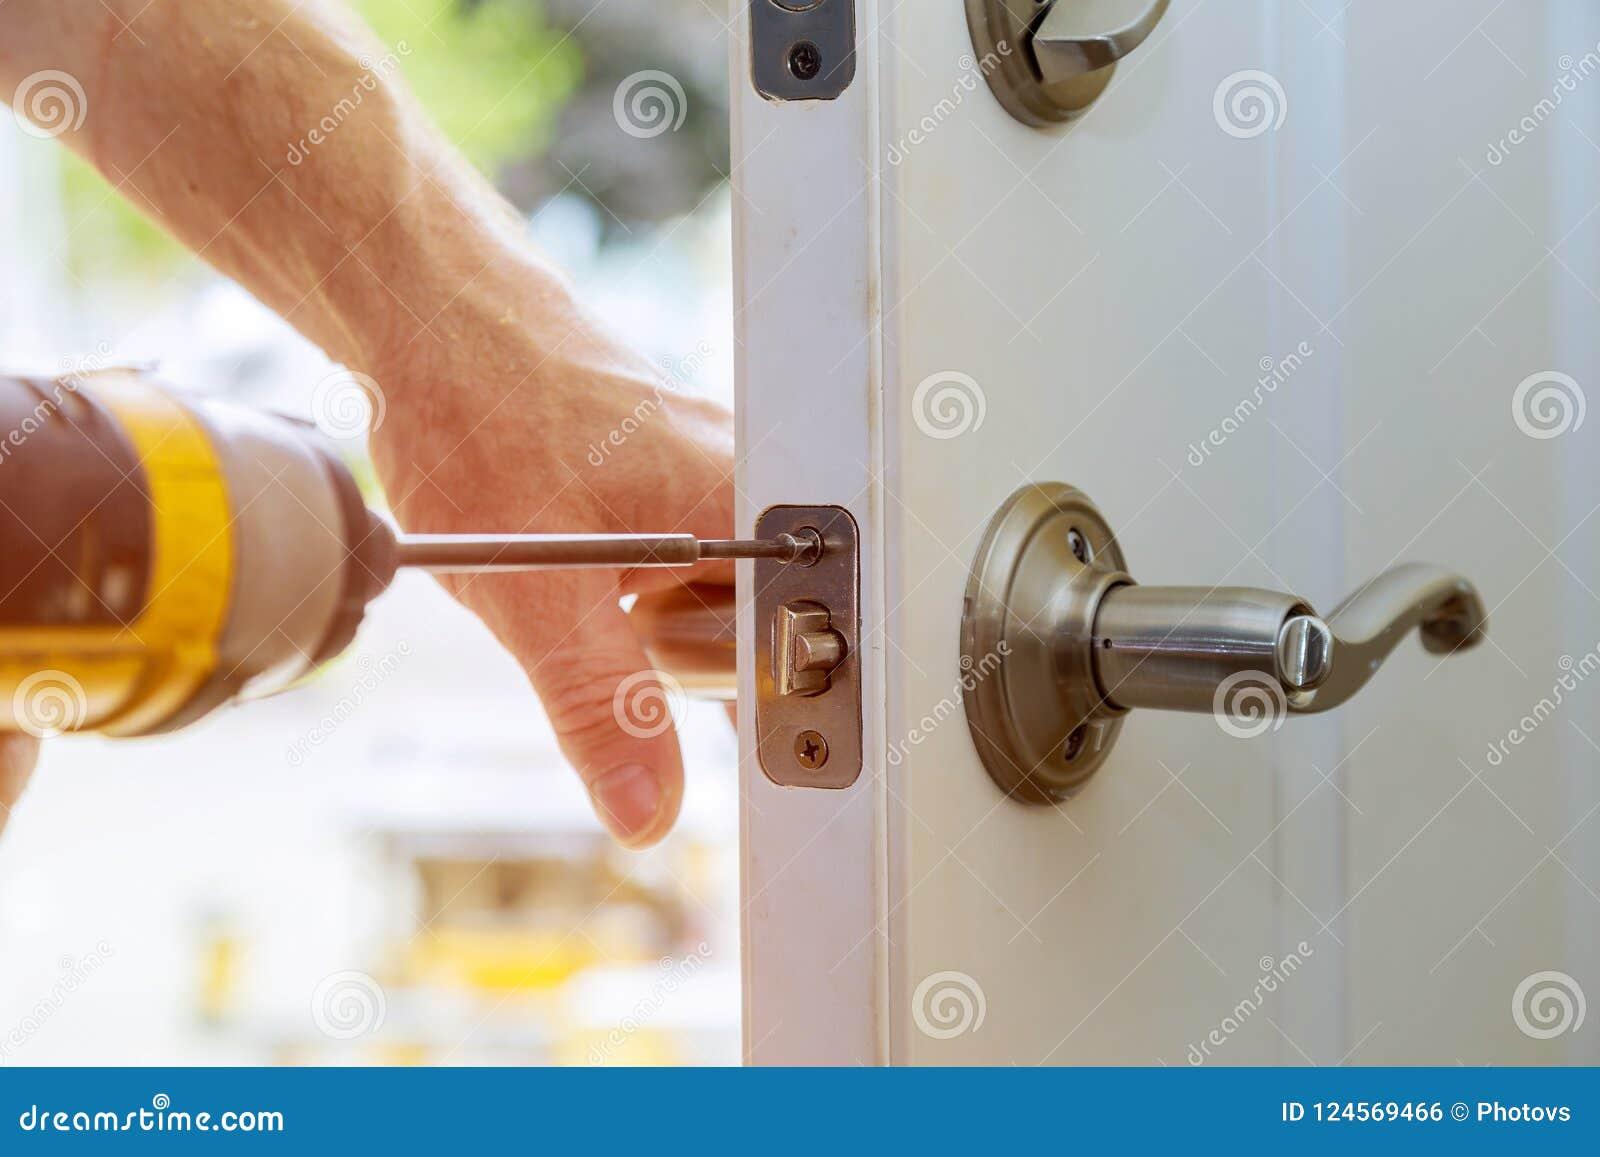 Install An Interior Door Lock Decoratingspecial Com